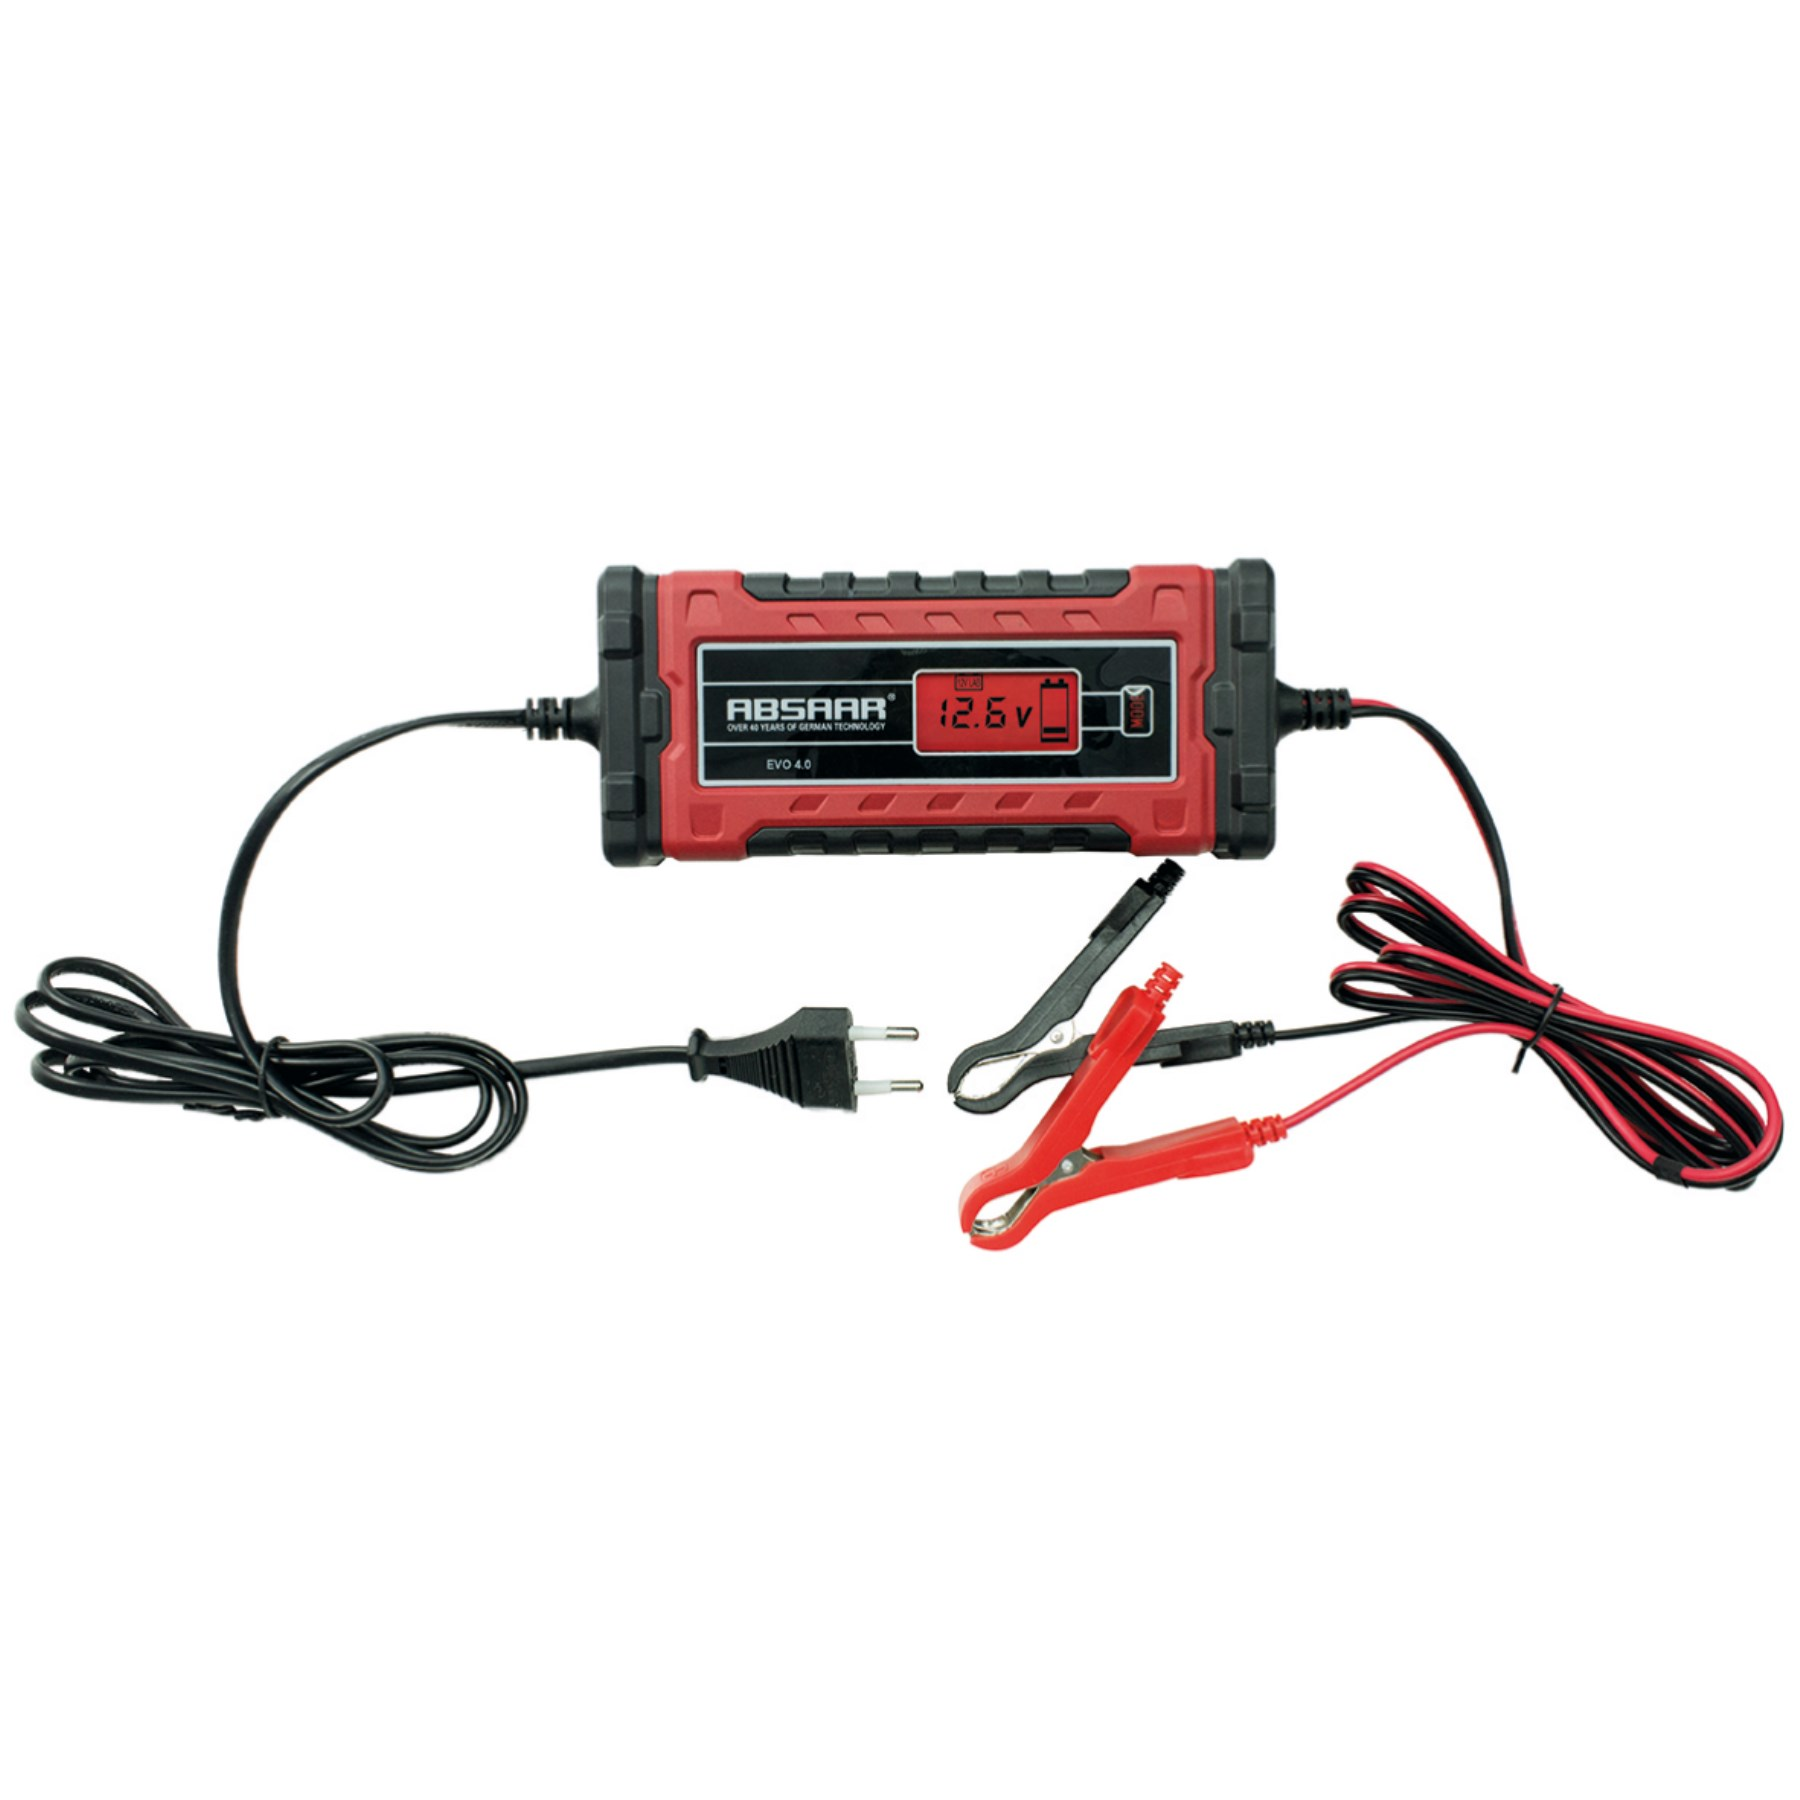 Absaar Batterieladegerät EVO 612V 4.0, 4A (1261186) LET'S